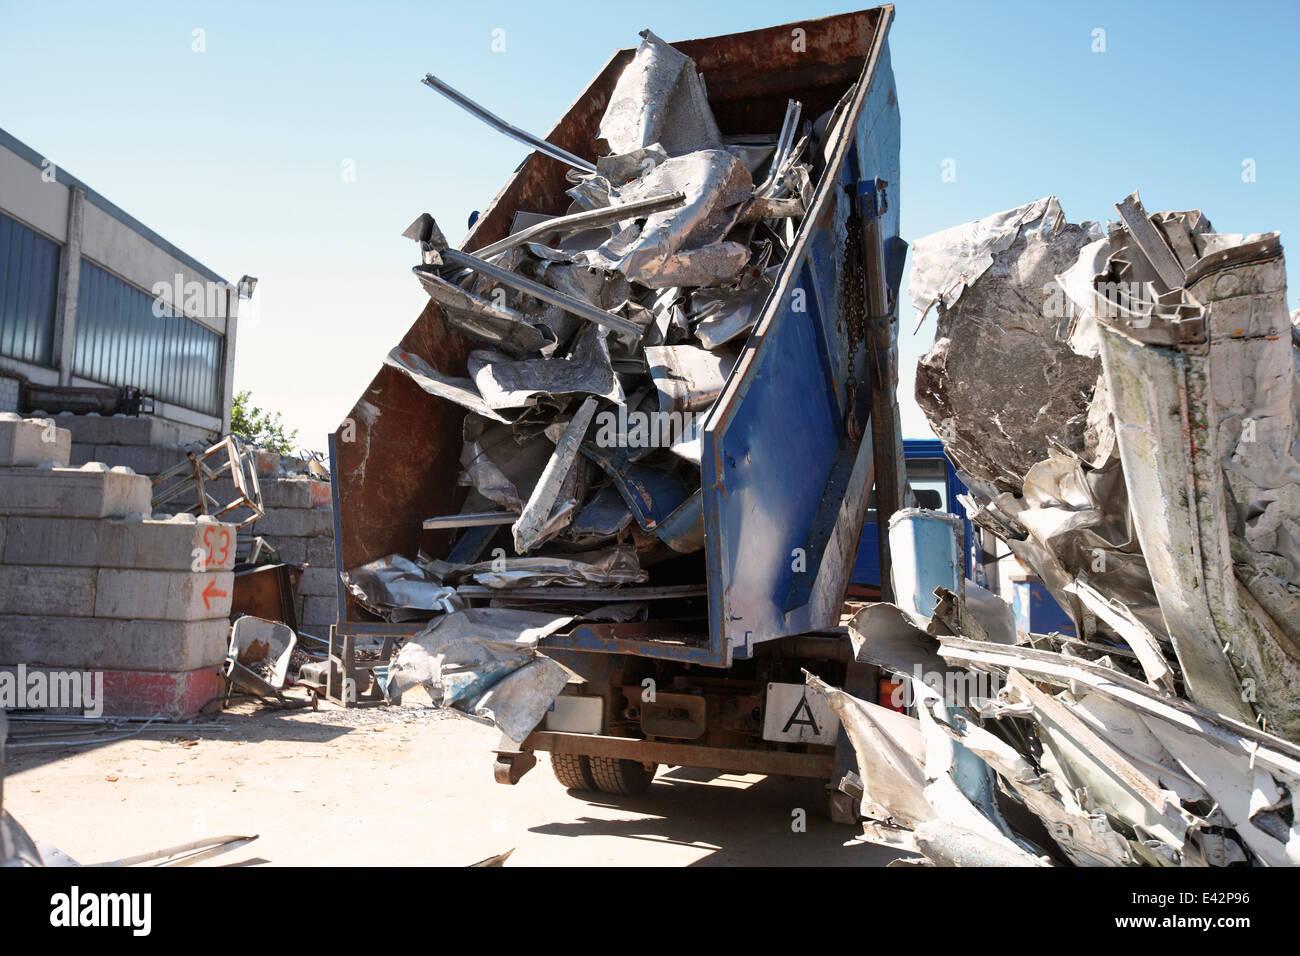 Muldenkipper Entleerung Aluminium aus überspringen in Schrottplatz Stockbild